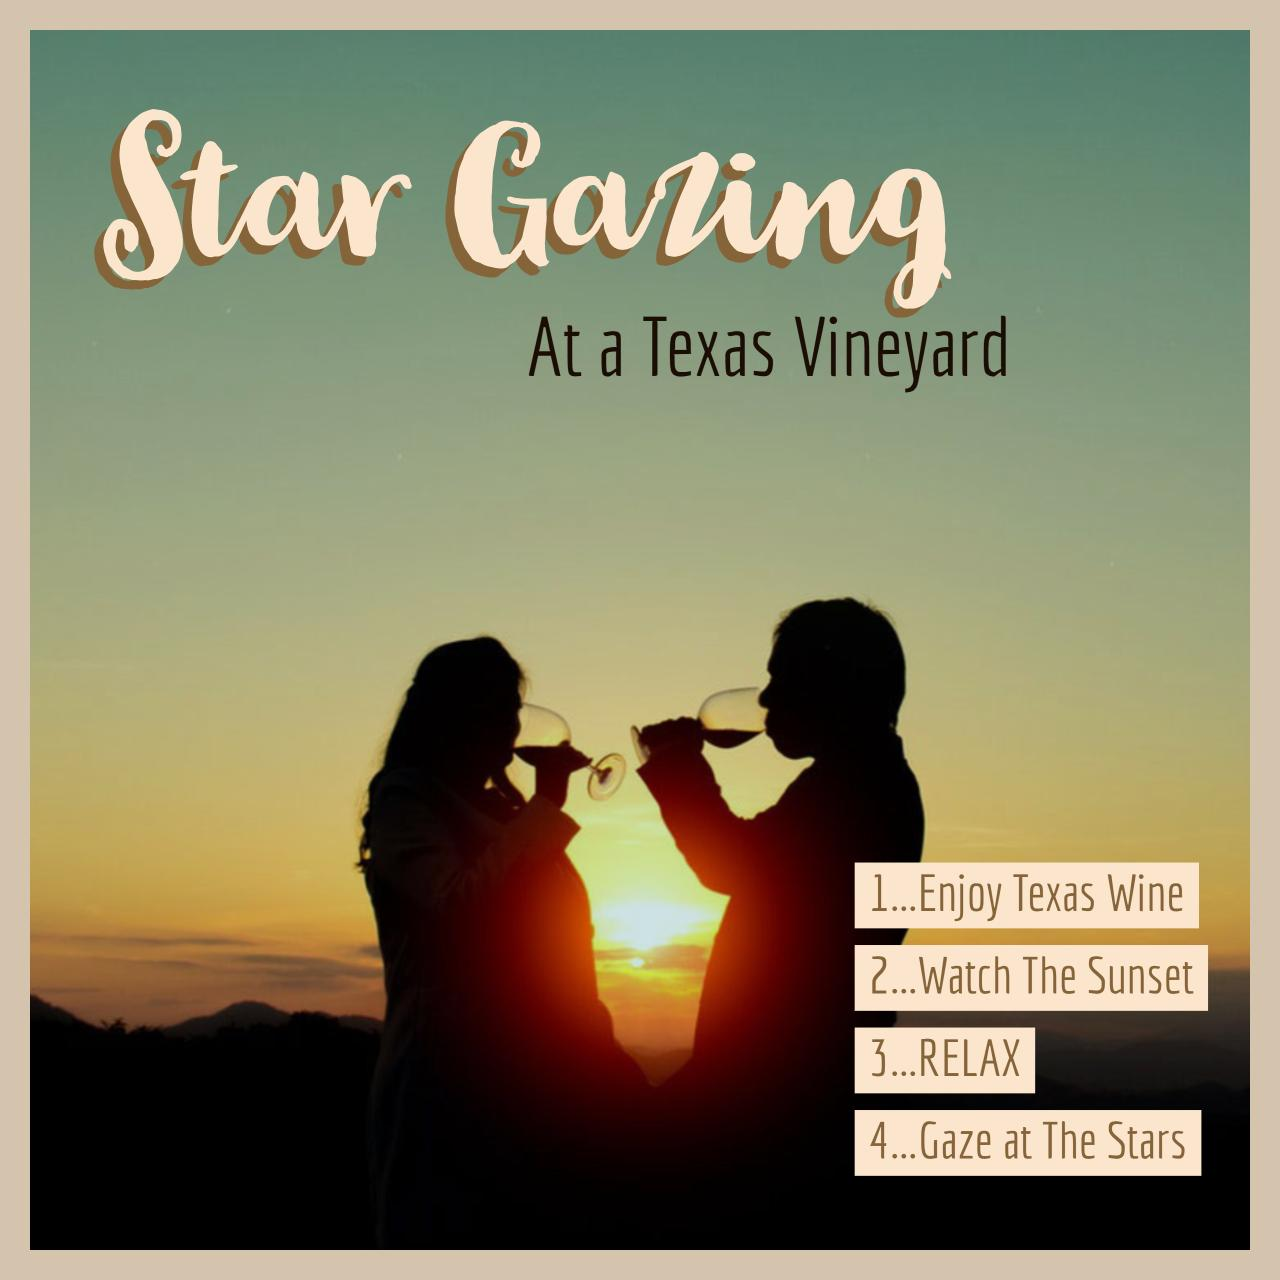 Star Gazing in The Vineyard